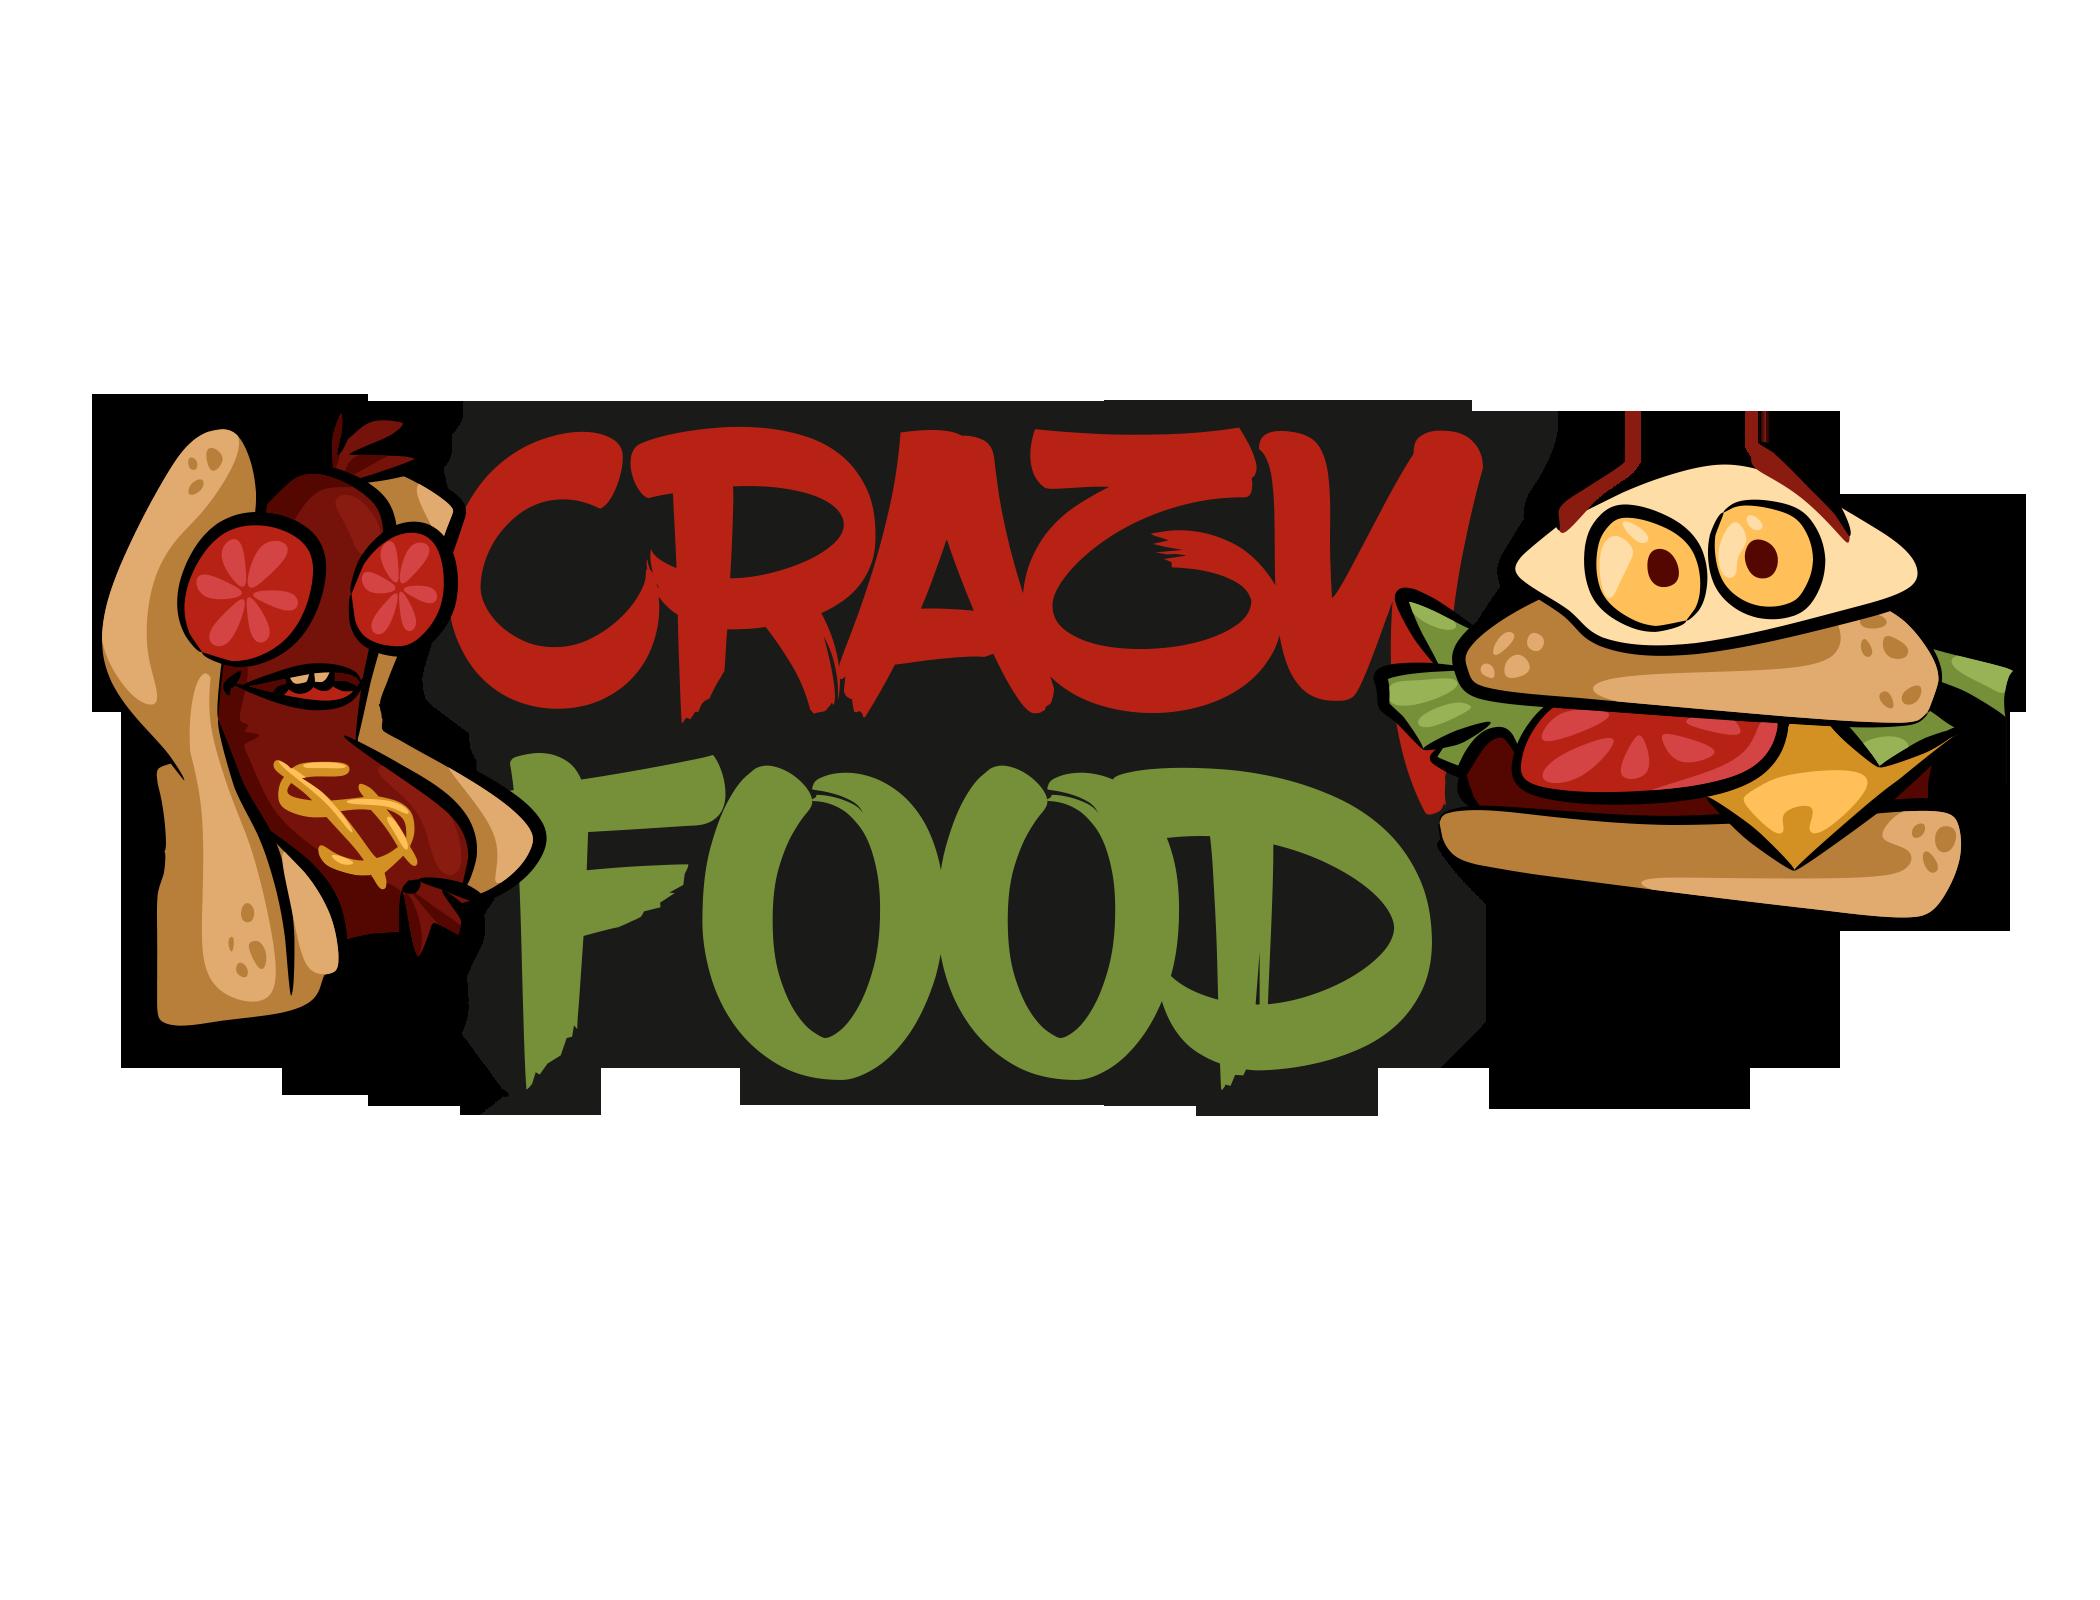 Разработать логотип и персонажа для кафе фото f_850595677b3eefb1.png